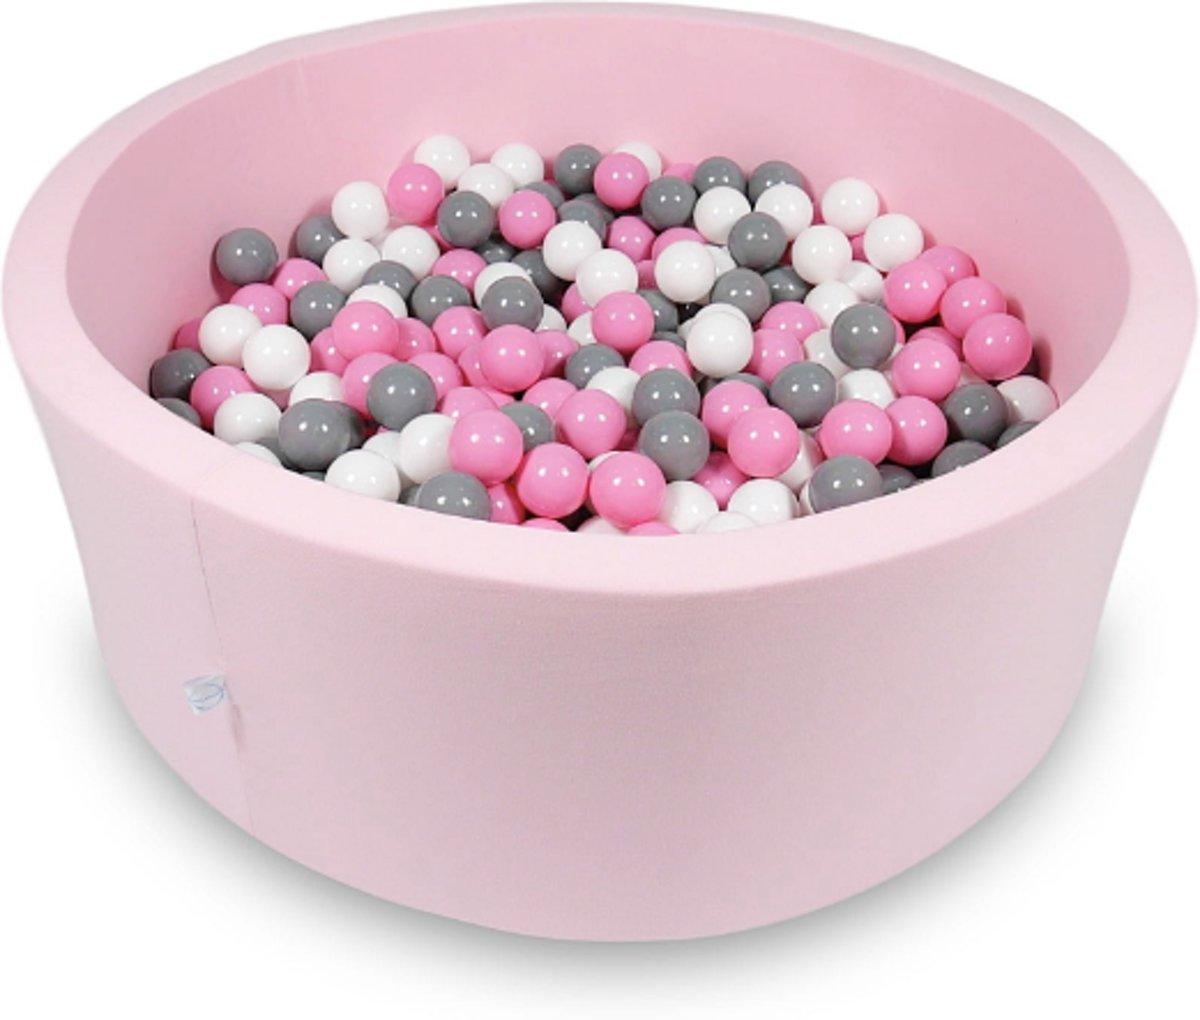 Ballenbak - 500 ballen - 115 x 40 cm - ballenbad - rond roze